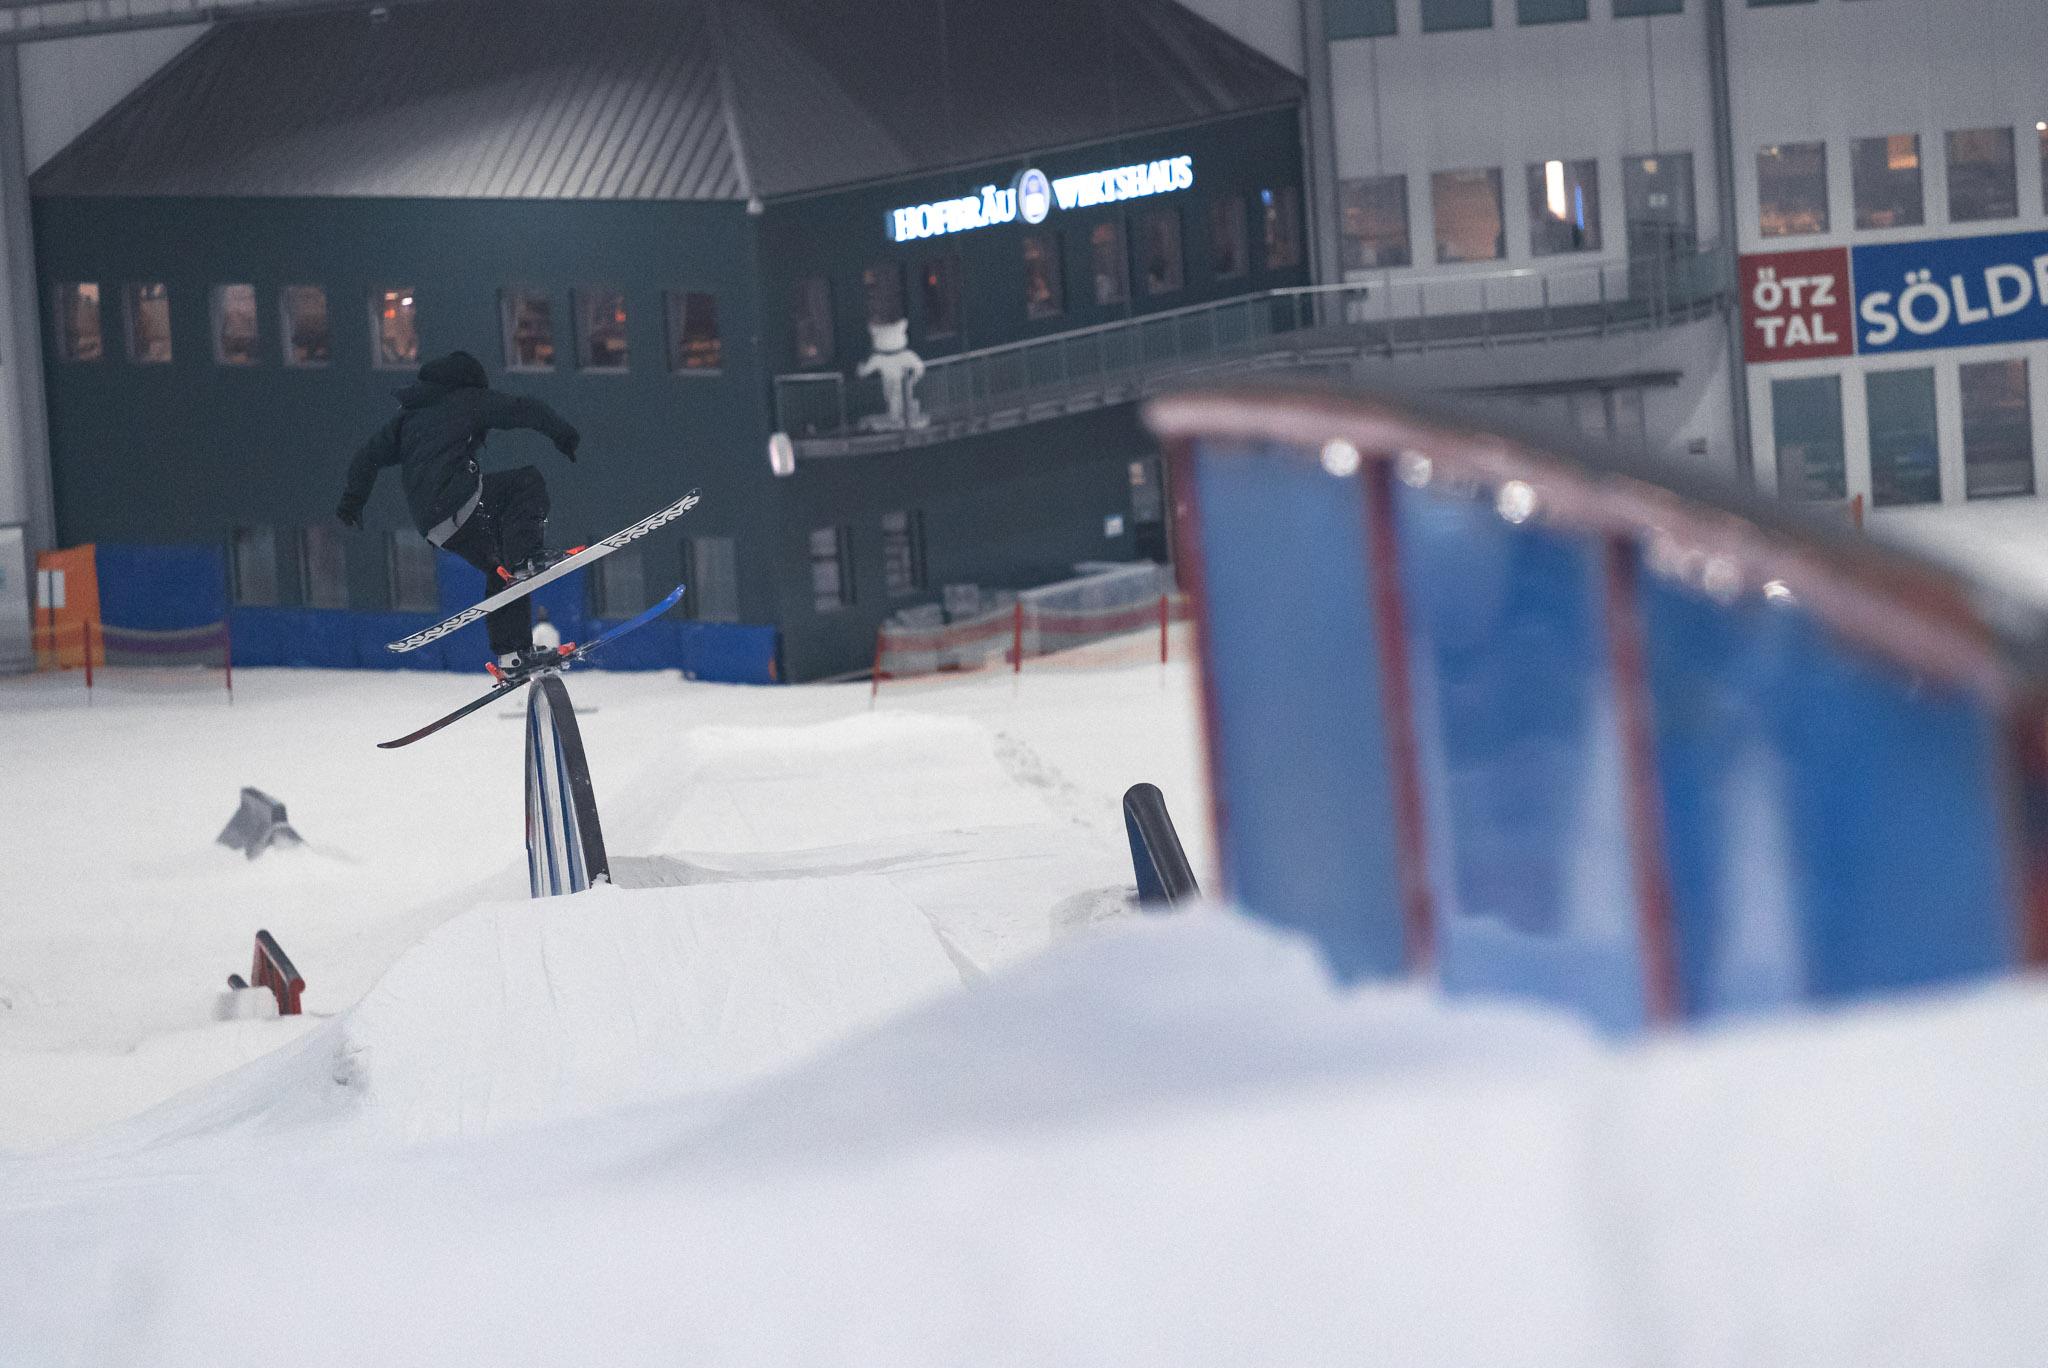 Torge Nagel am Rainbow Rail im Snowpark Bispingen